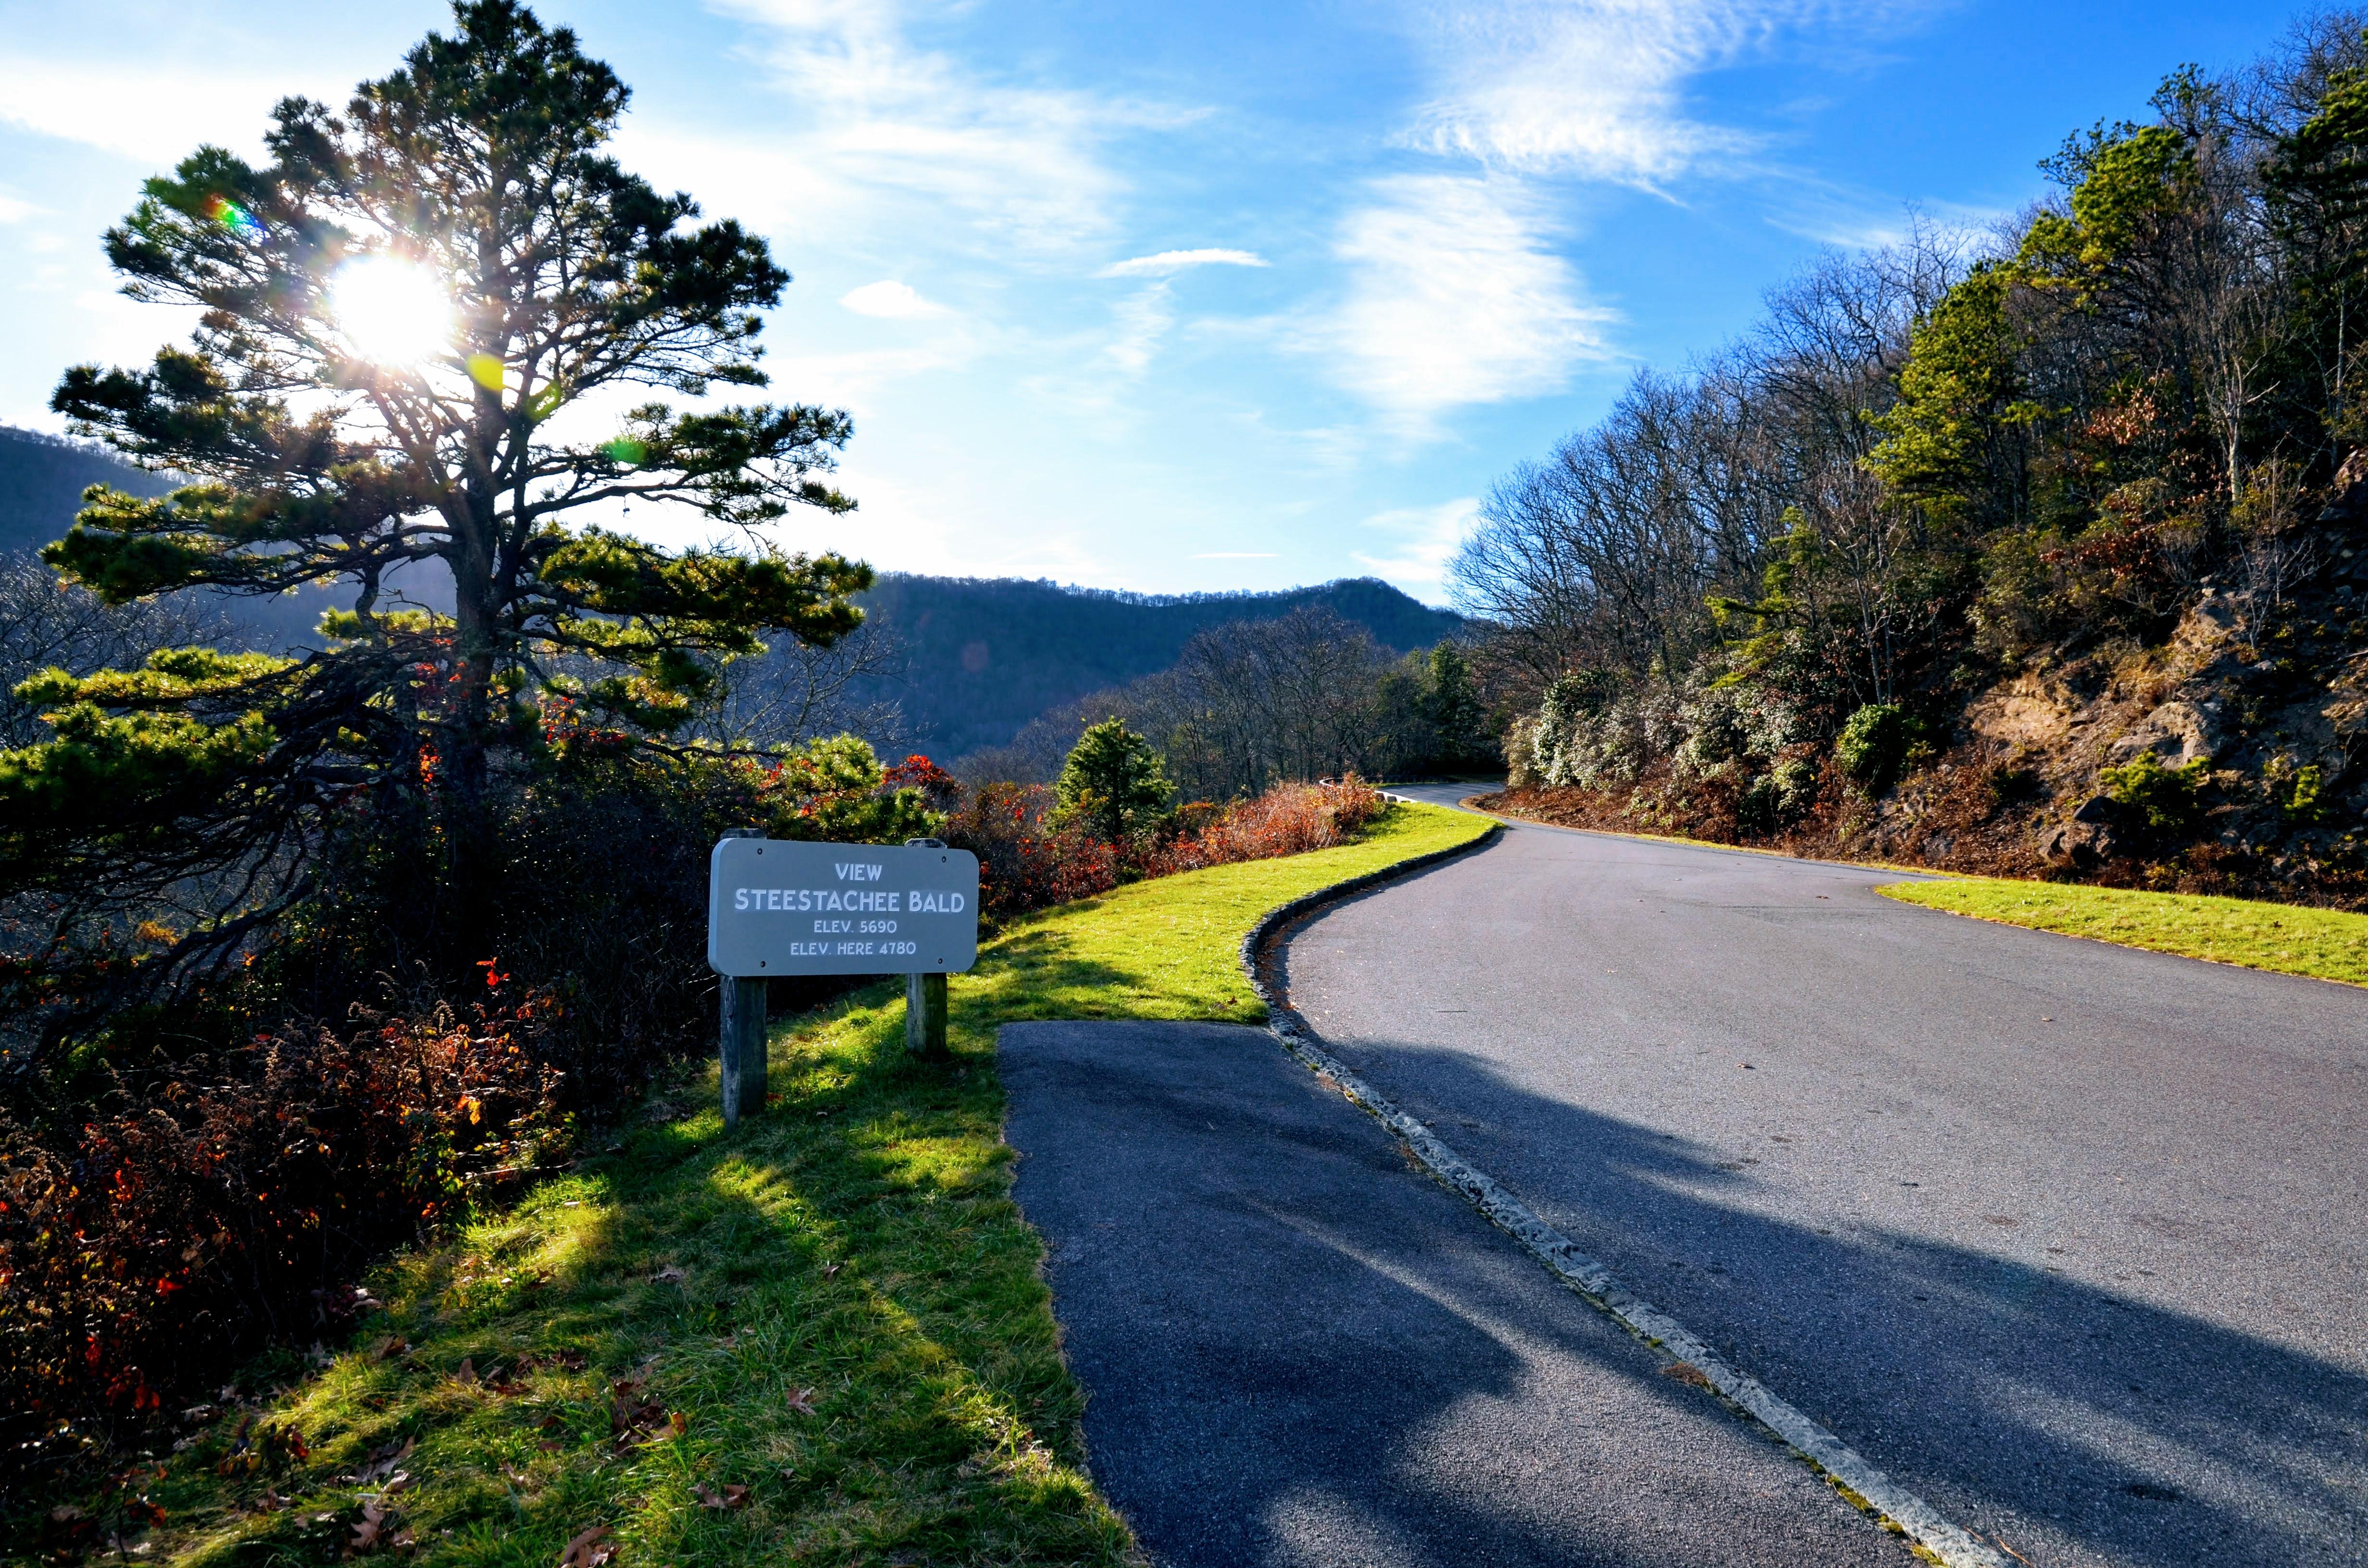 On the Blue Ridge Parkway, North Carolina